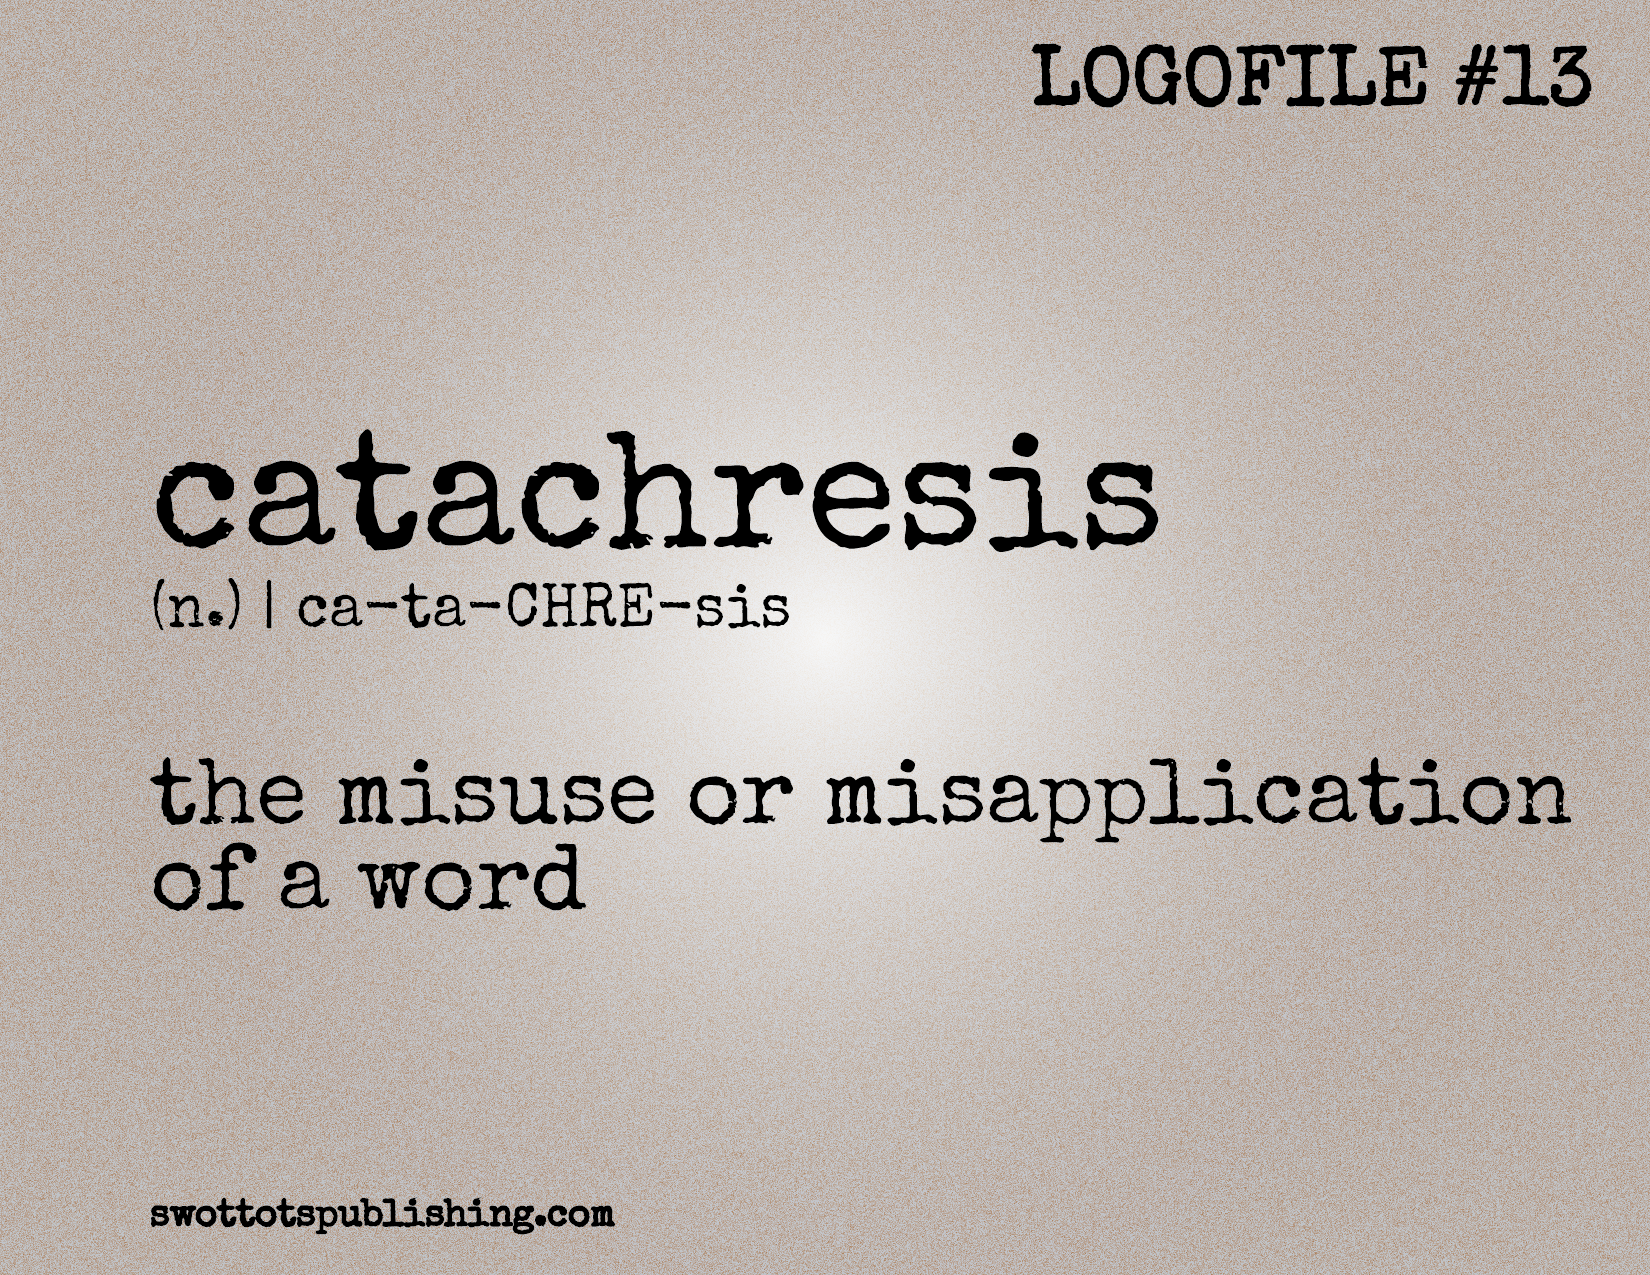 STP Logofile #13 | catachresis (n.)